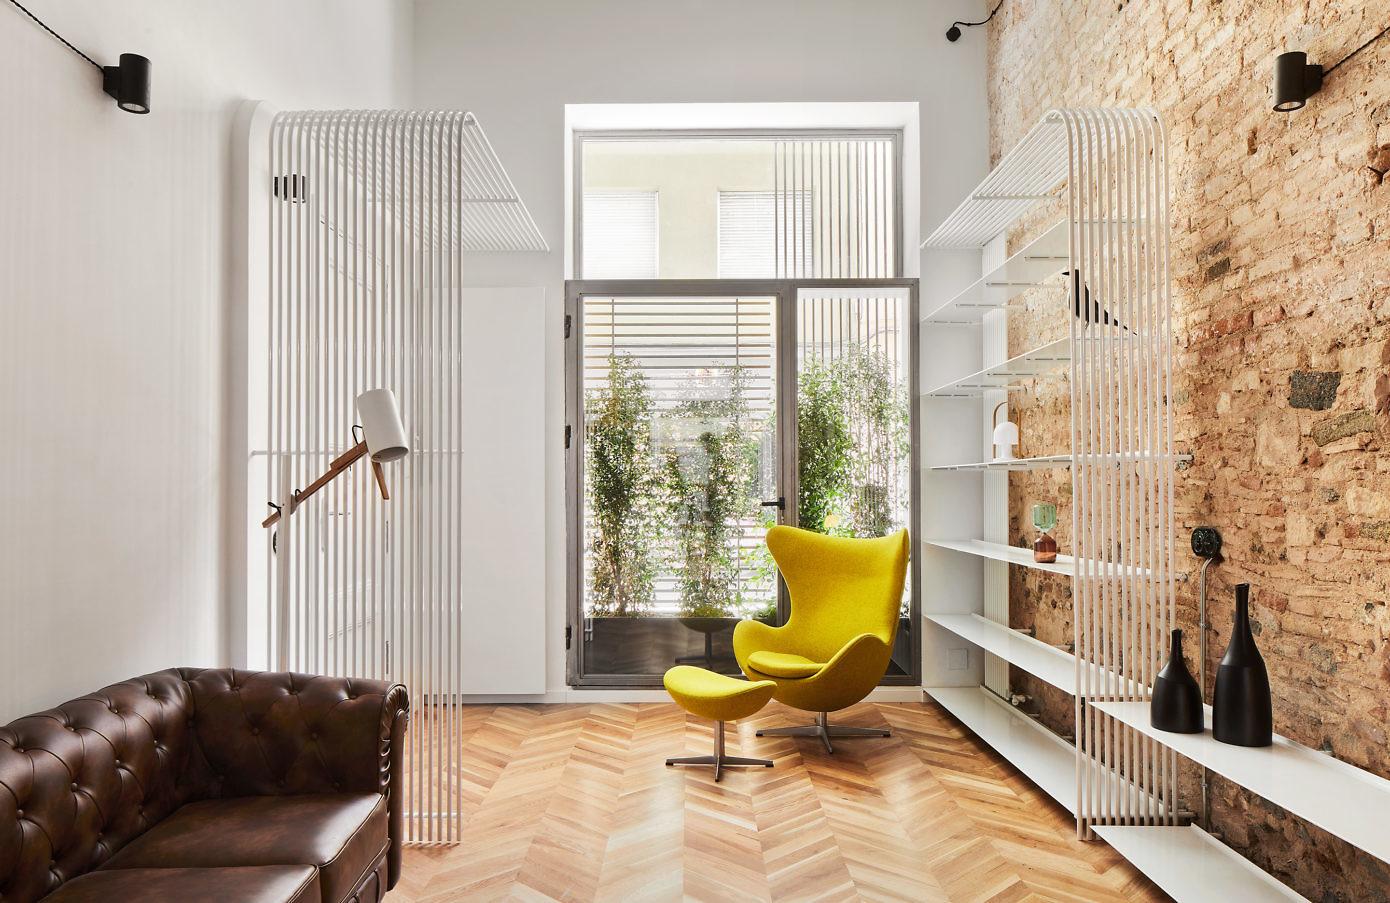 Apartment in Barcelona by Valentí Albareda